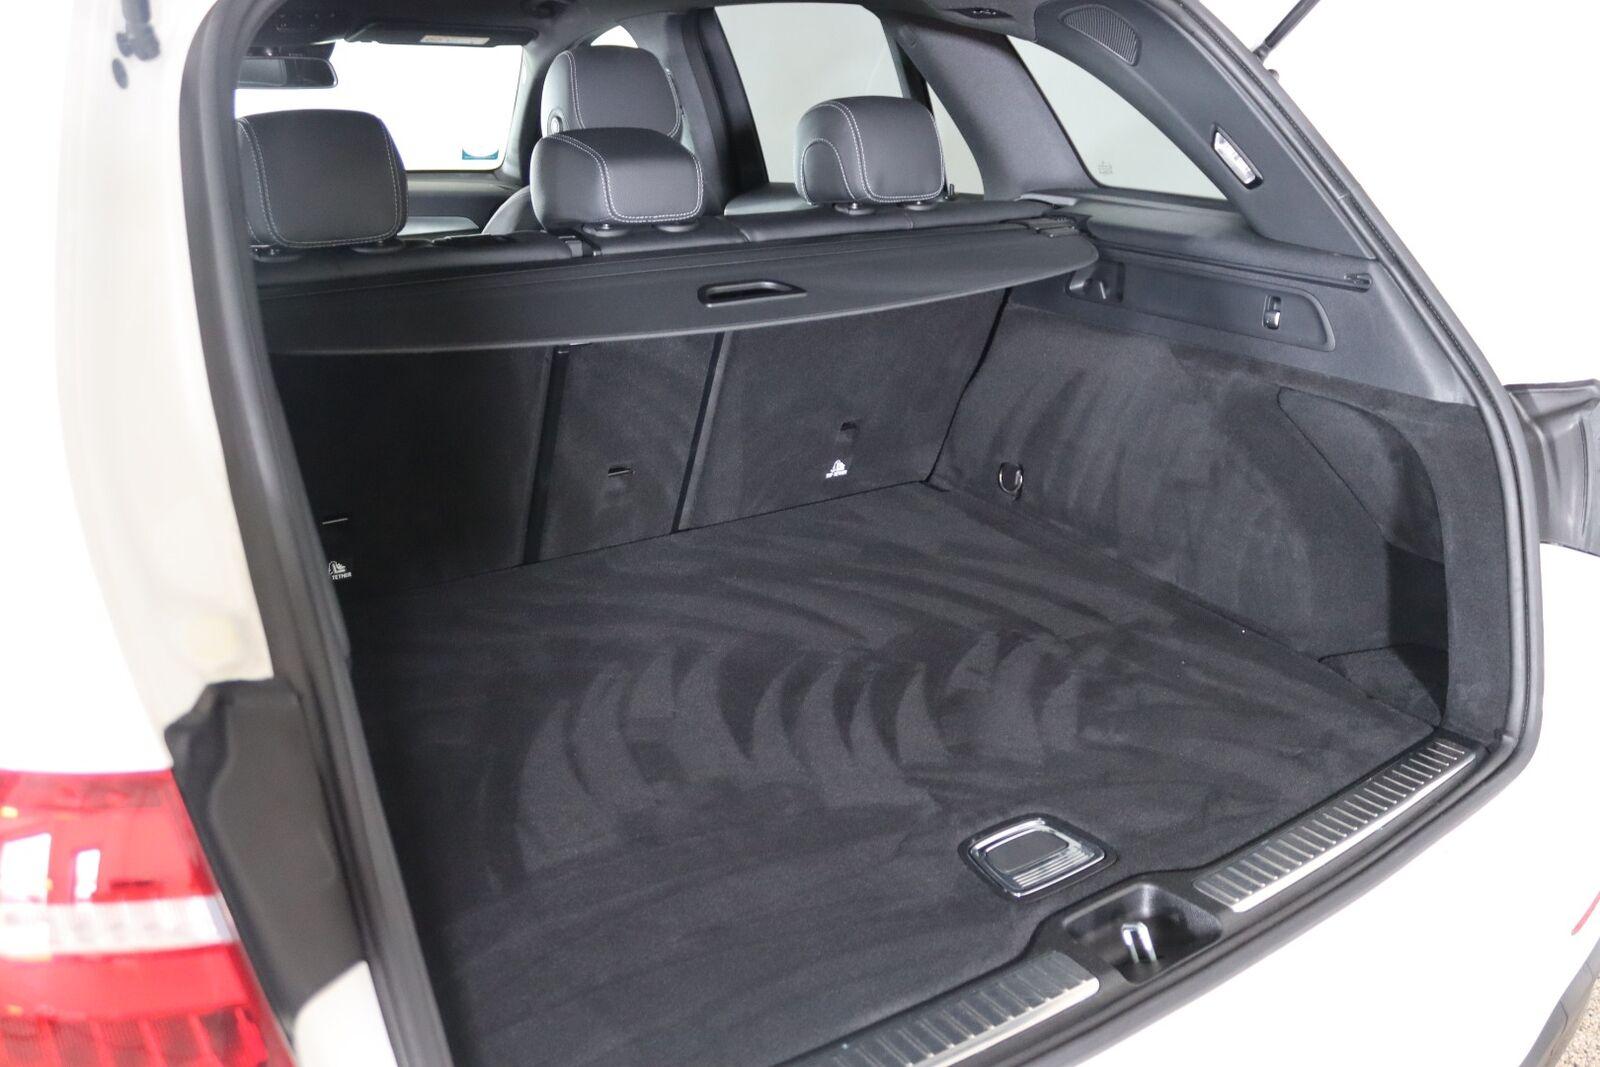 Mercedes GLC350 d 3,0 AMG Line aut. 4Matic - billede 7